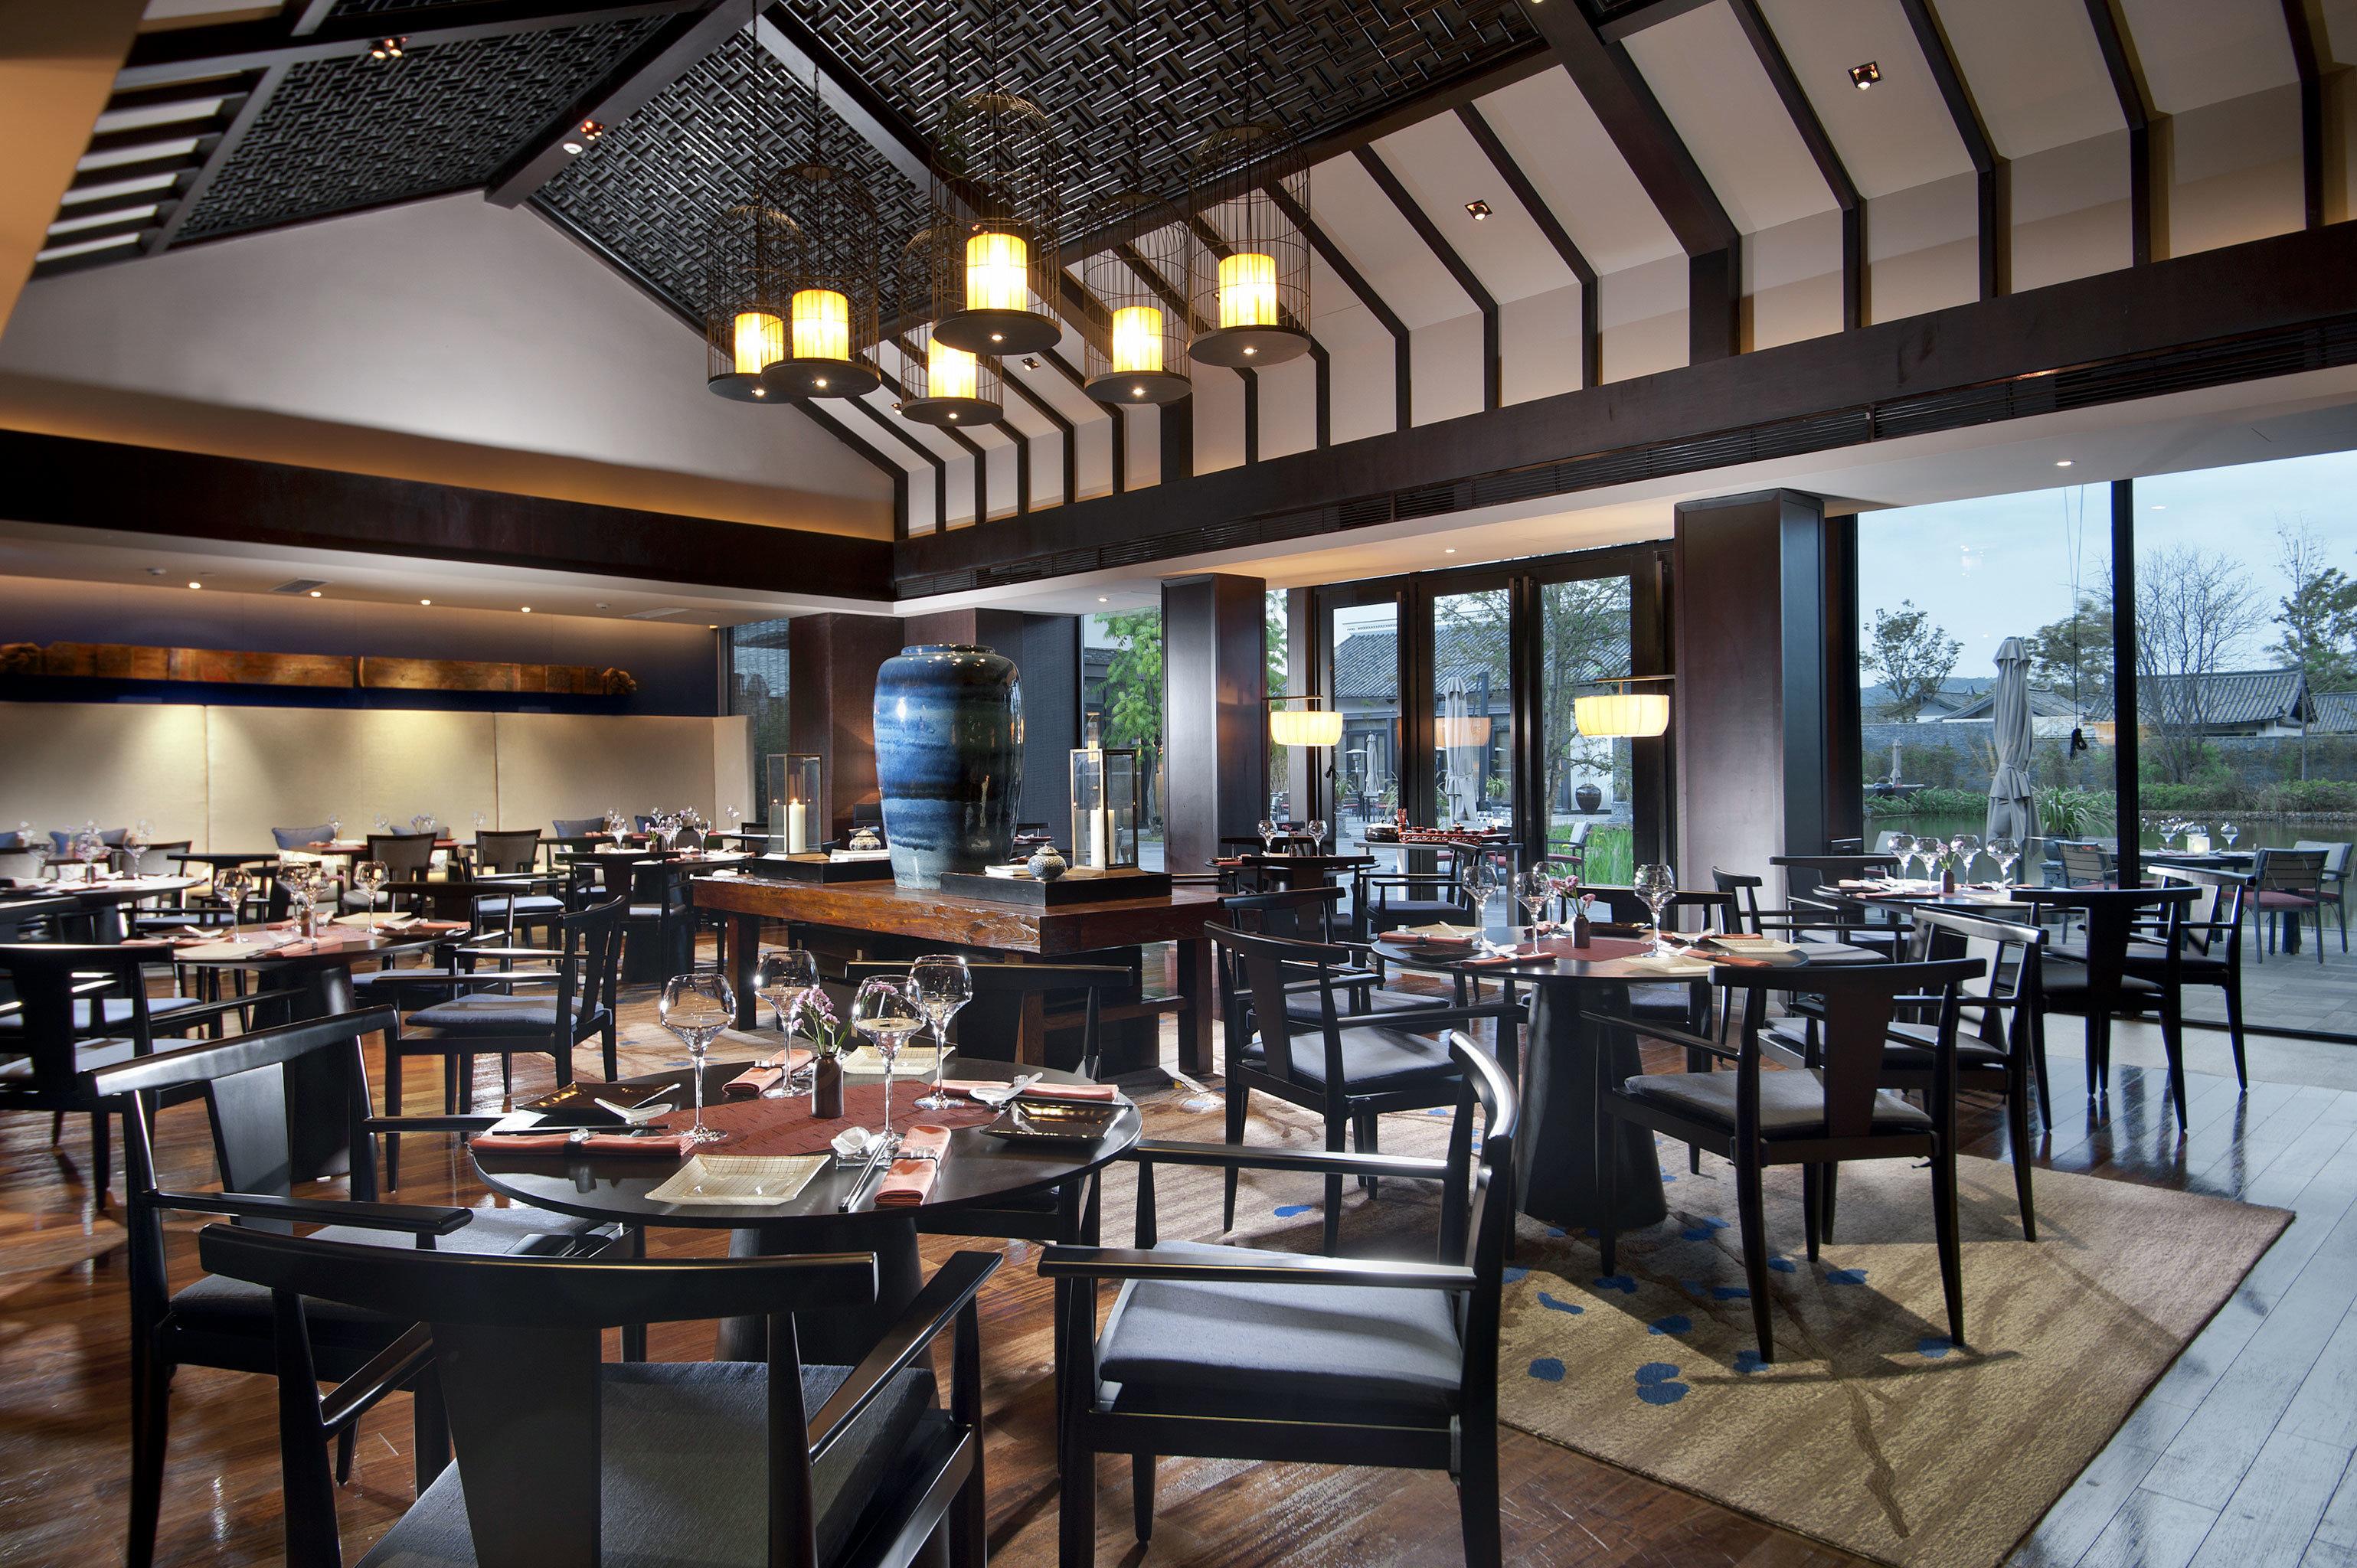 Dining Drink Eat Patio Resort chair restaurant Bar café function hall set